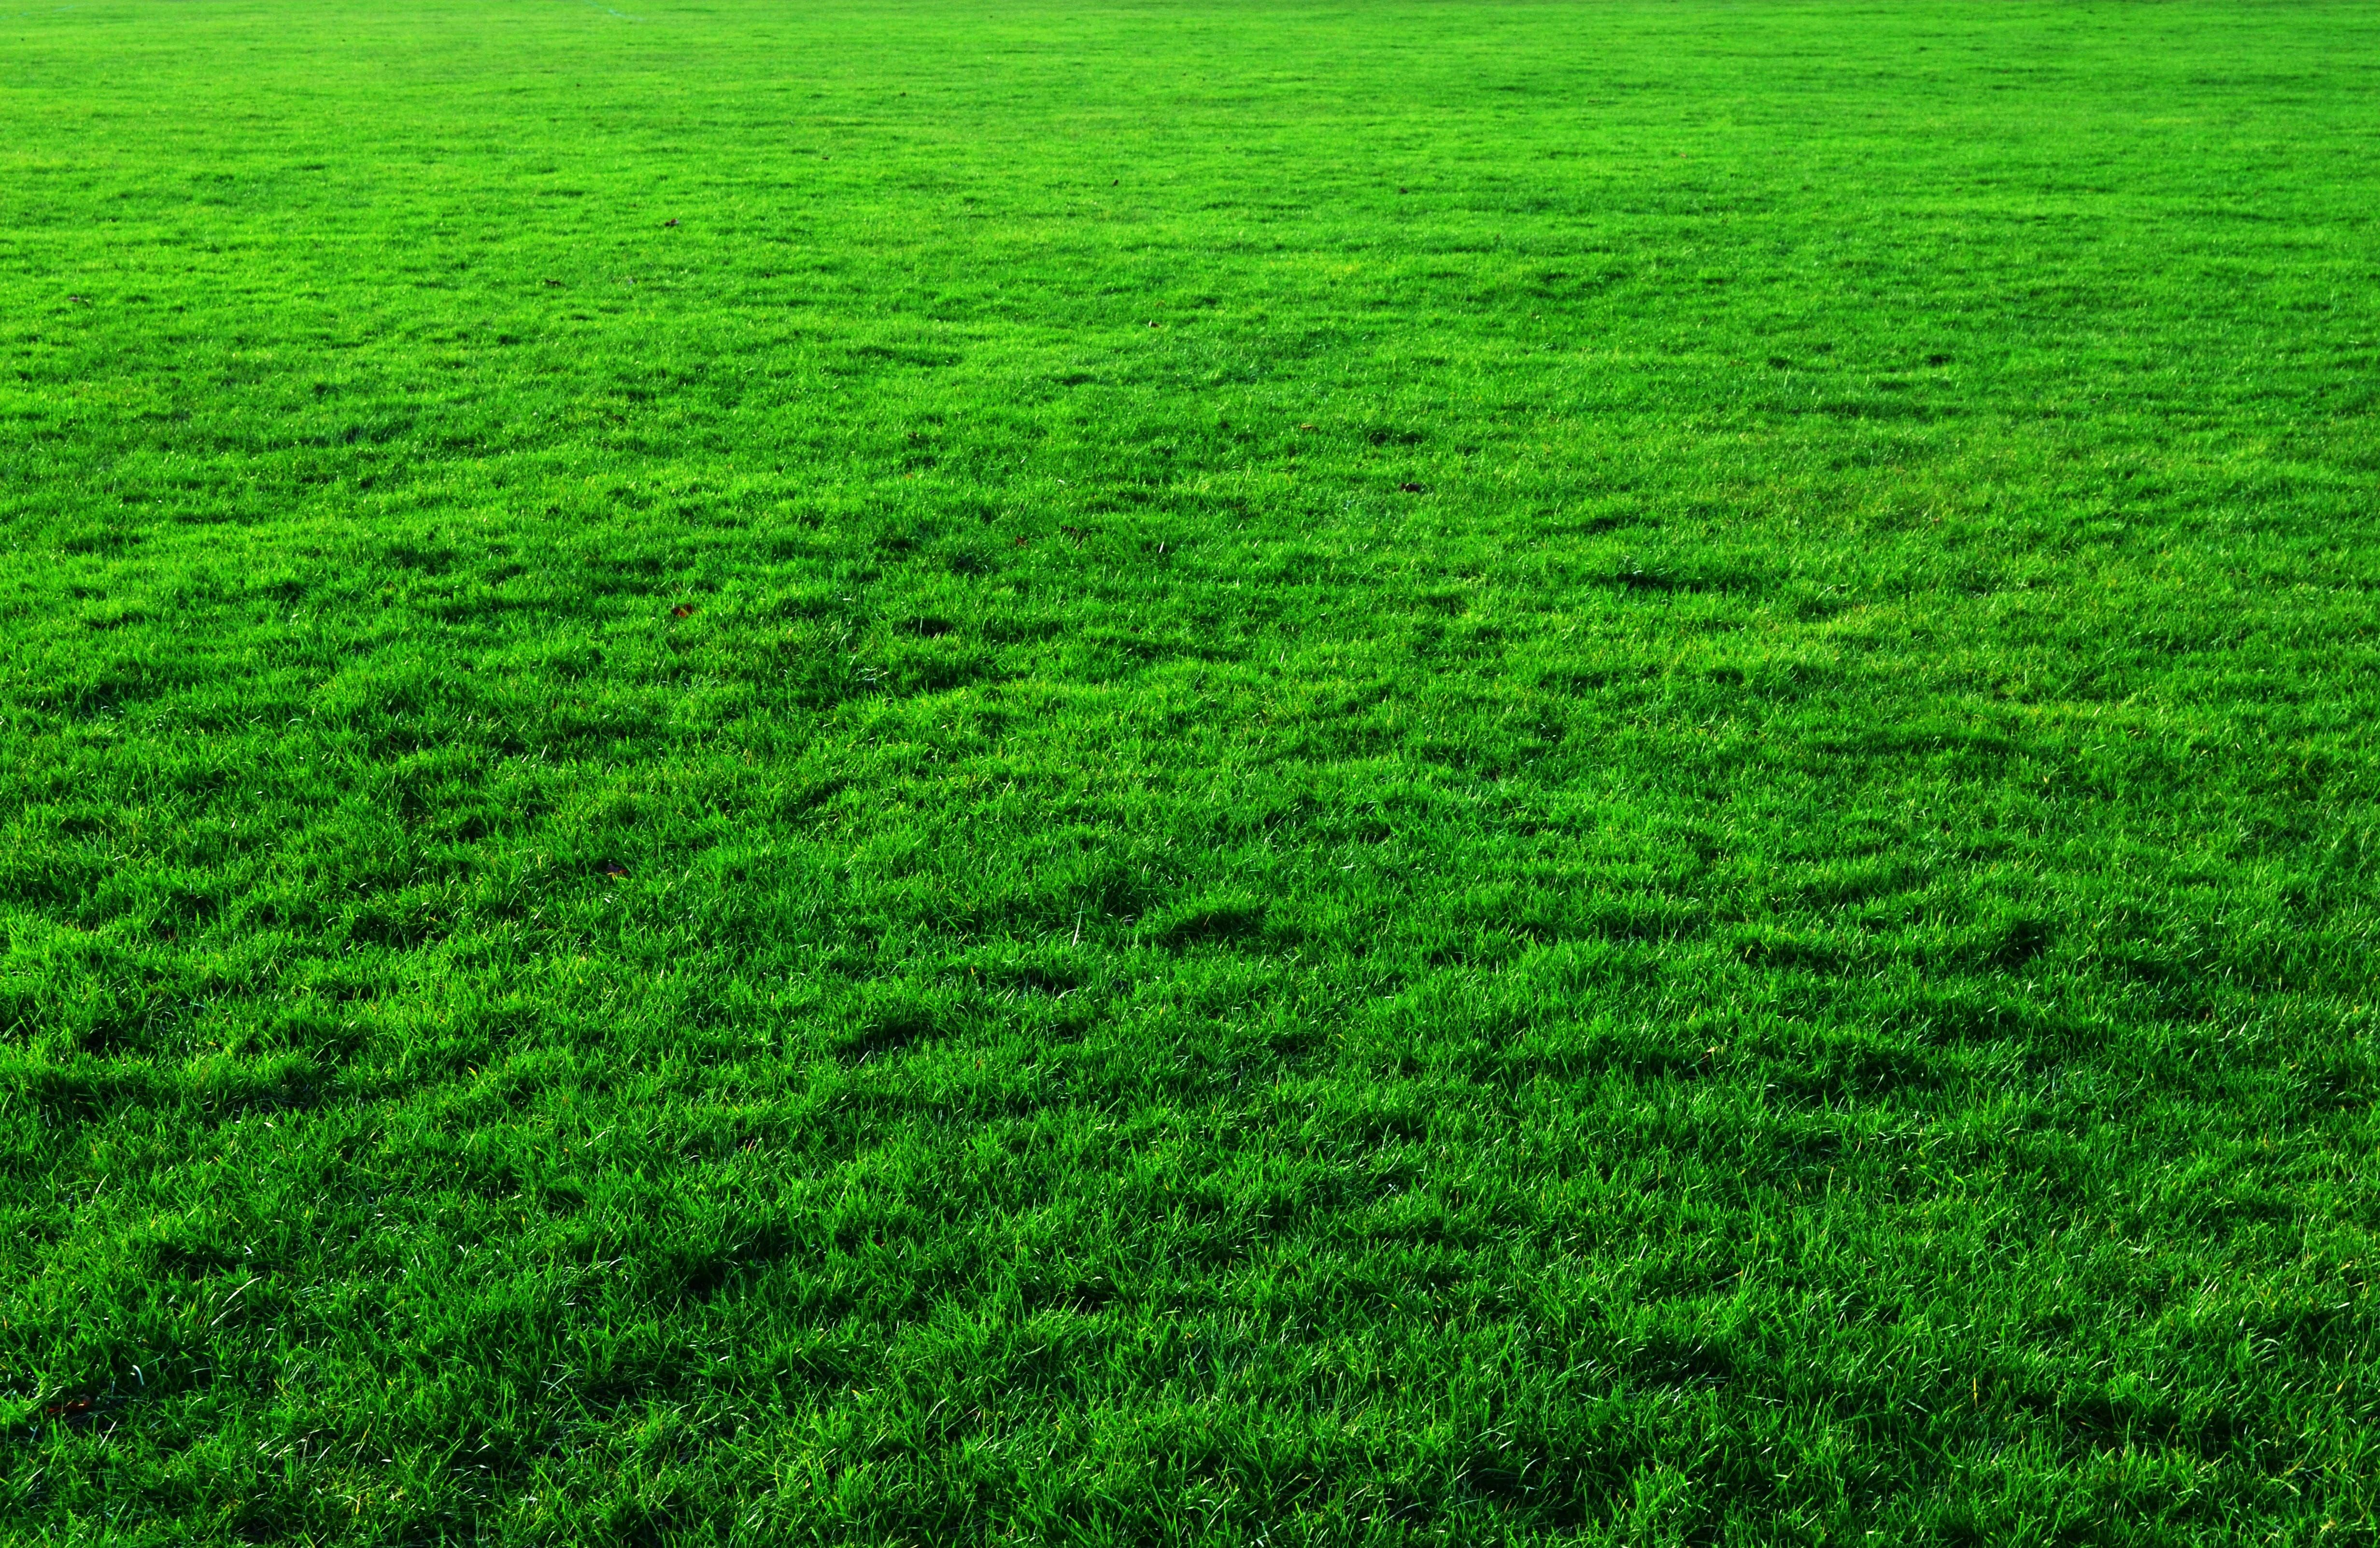 Green grass background green grass background photos